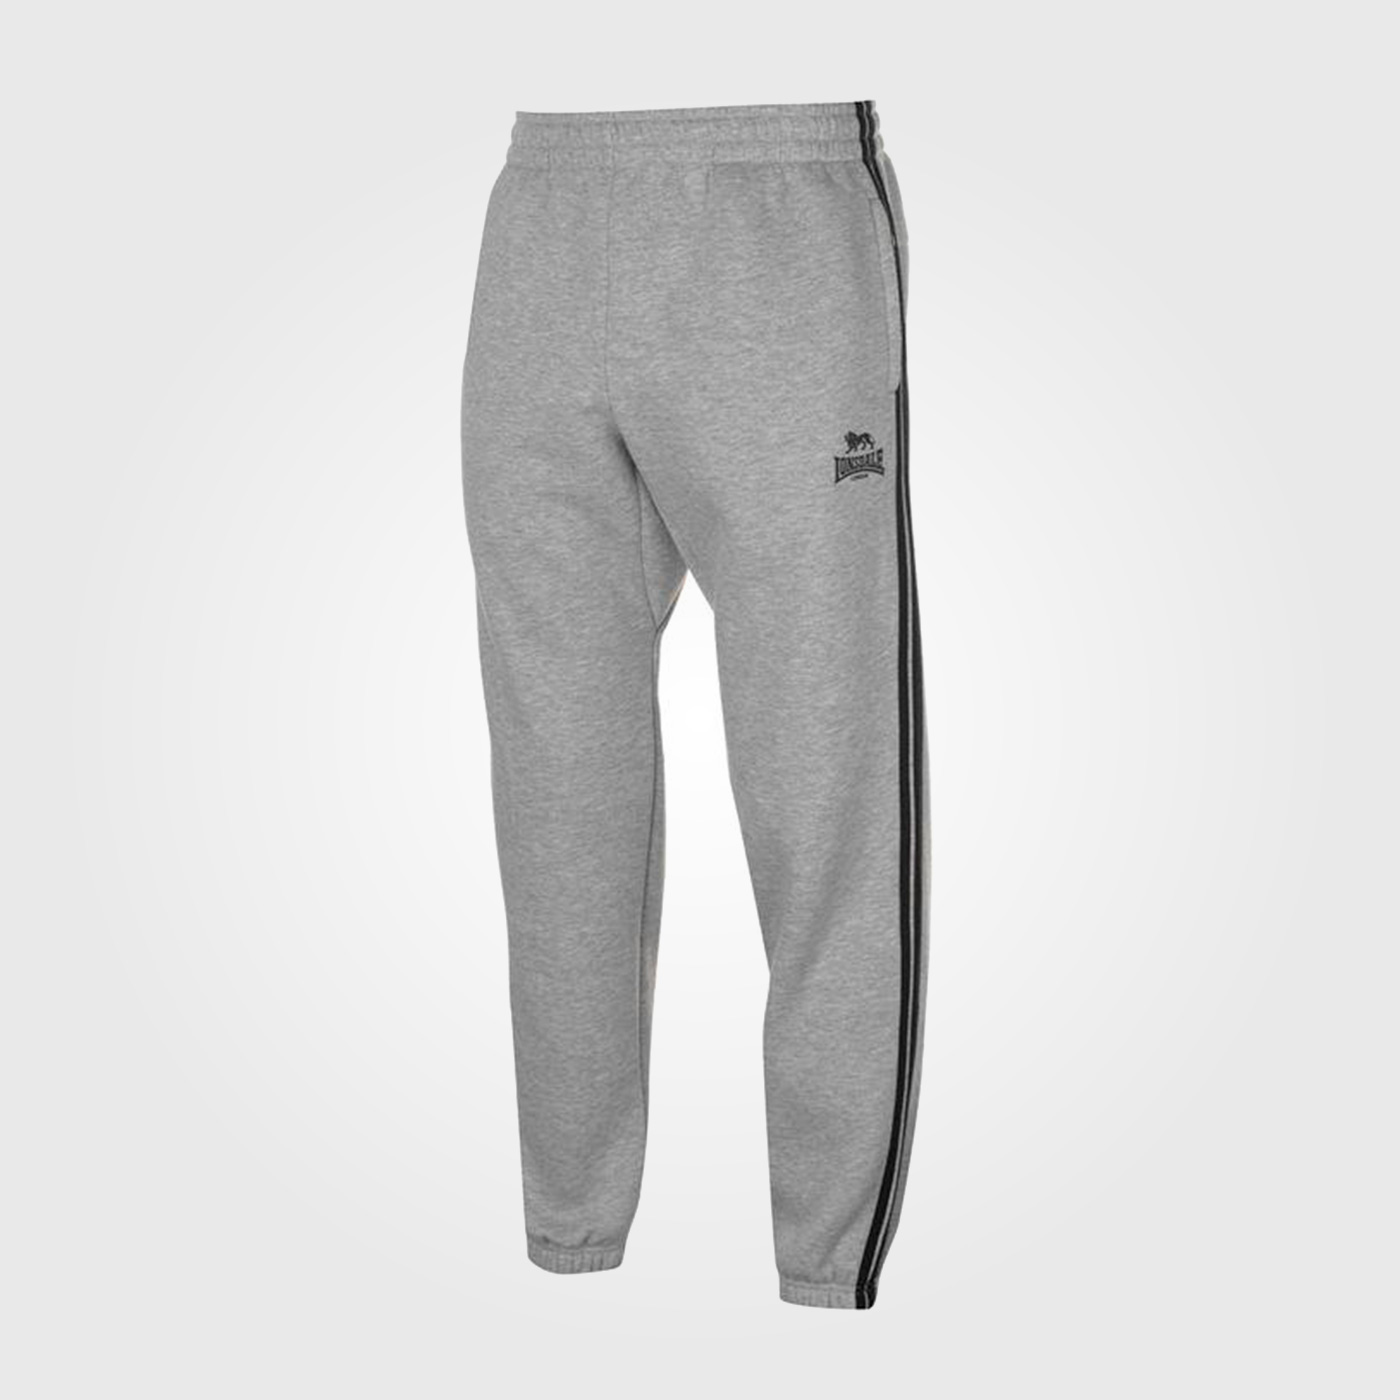 Спортивные штаны Lonsdale 2 Stripe Jogging Mens Grey Marl/Black